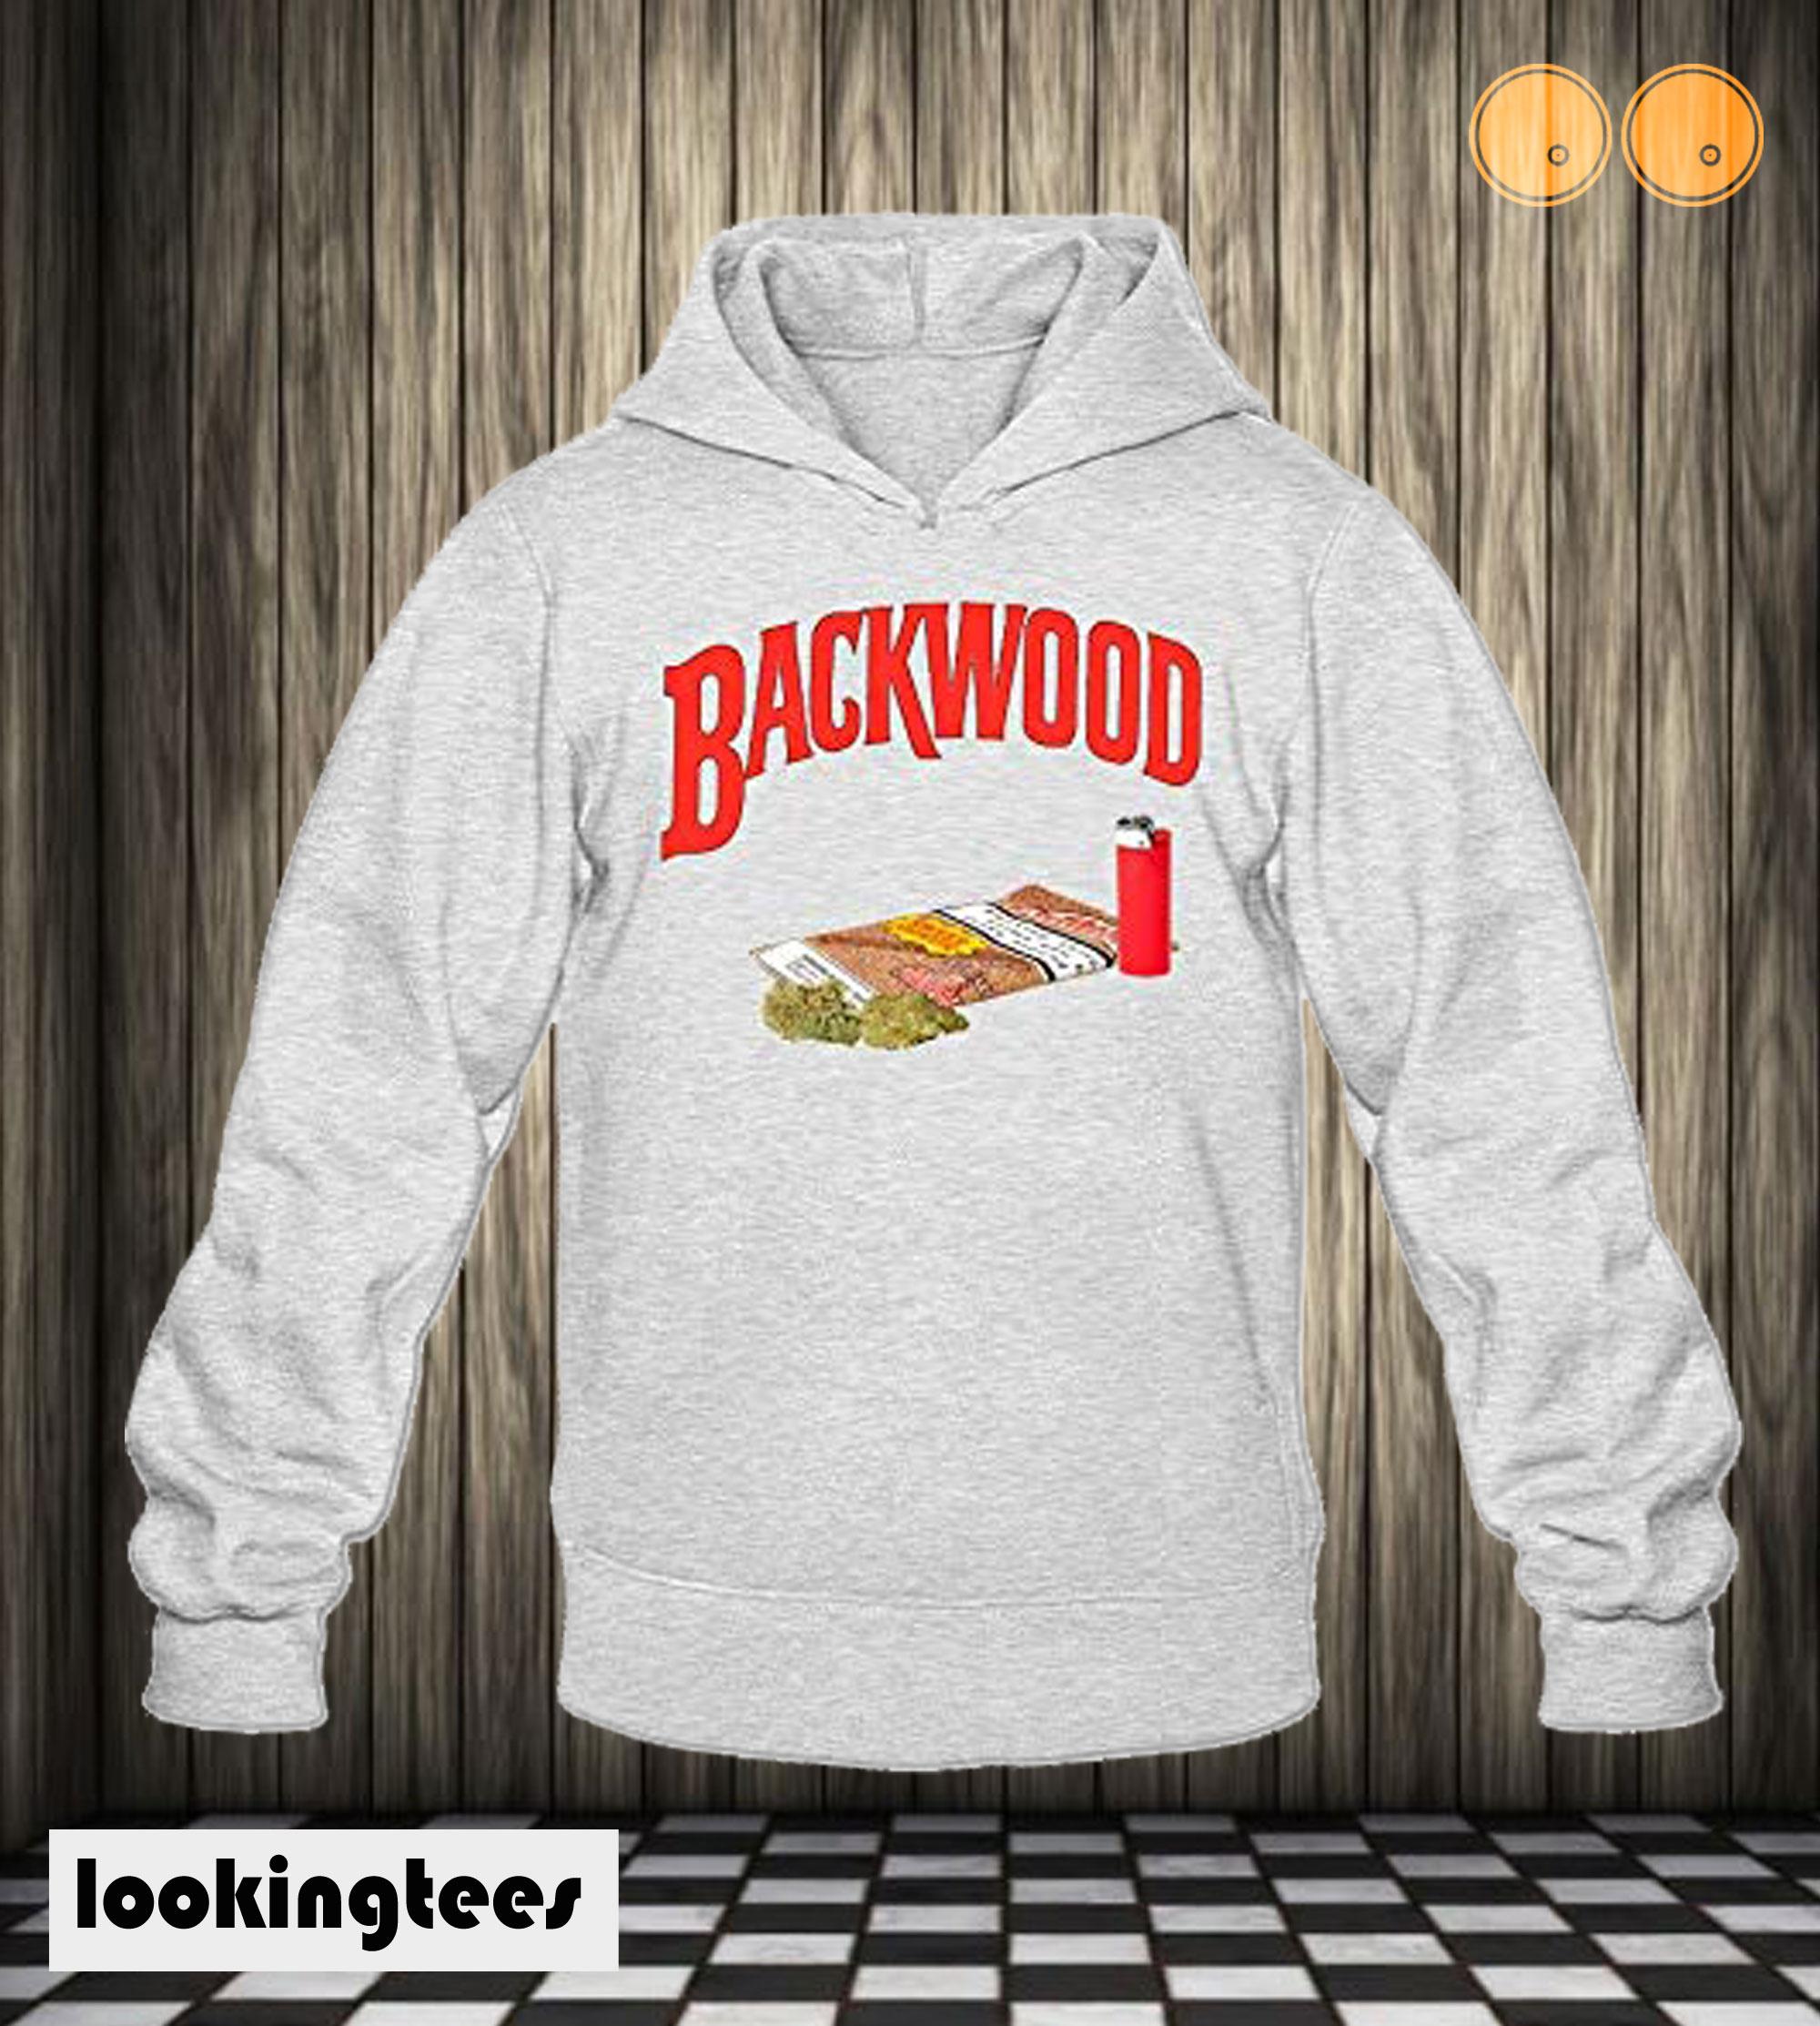 Sungboys Backwood Hoodie